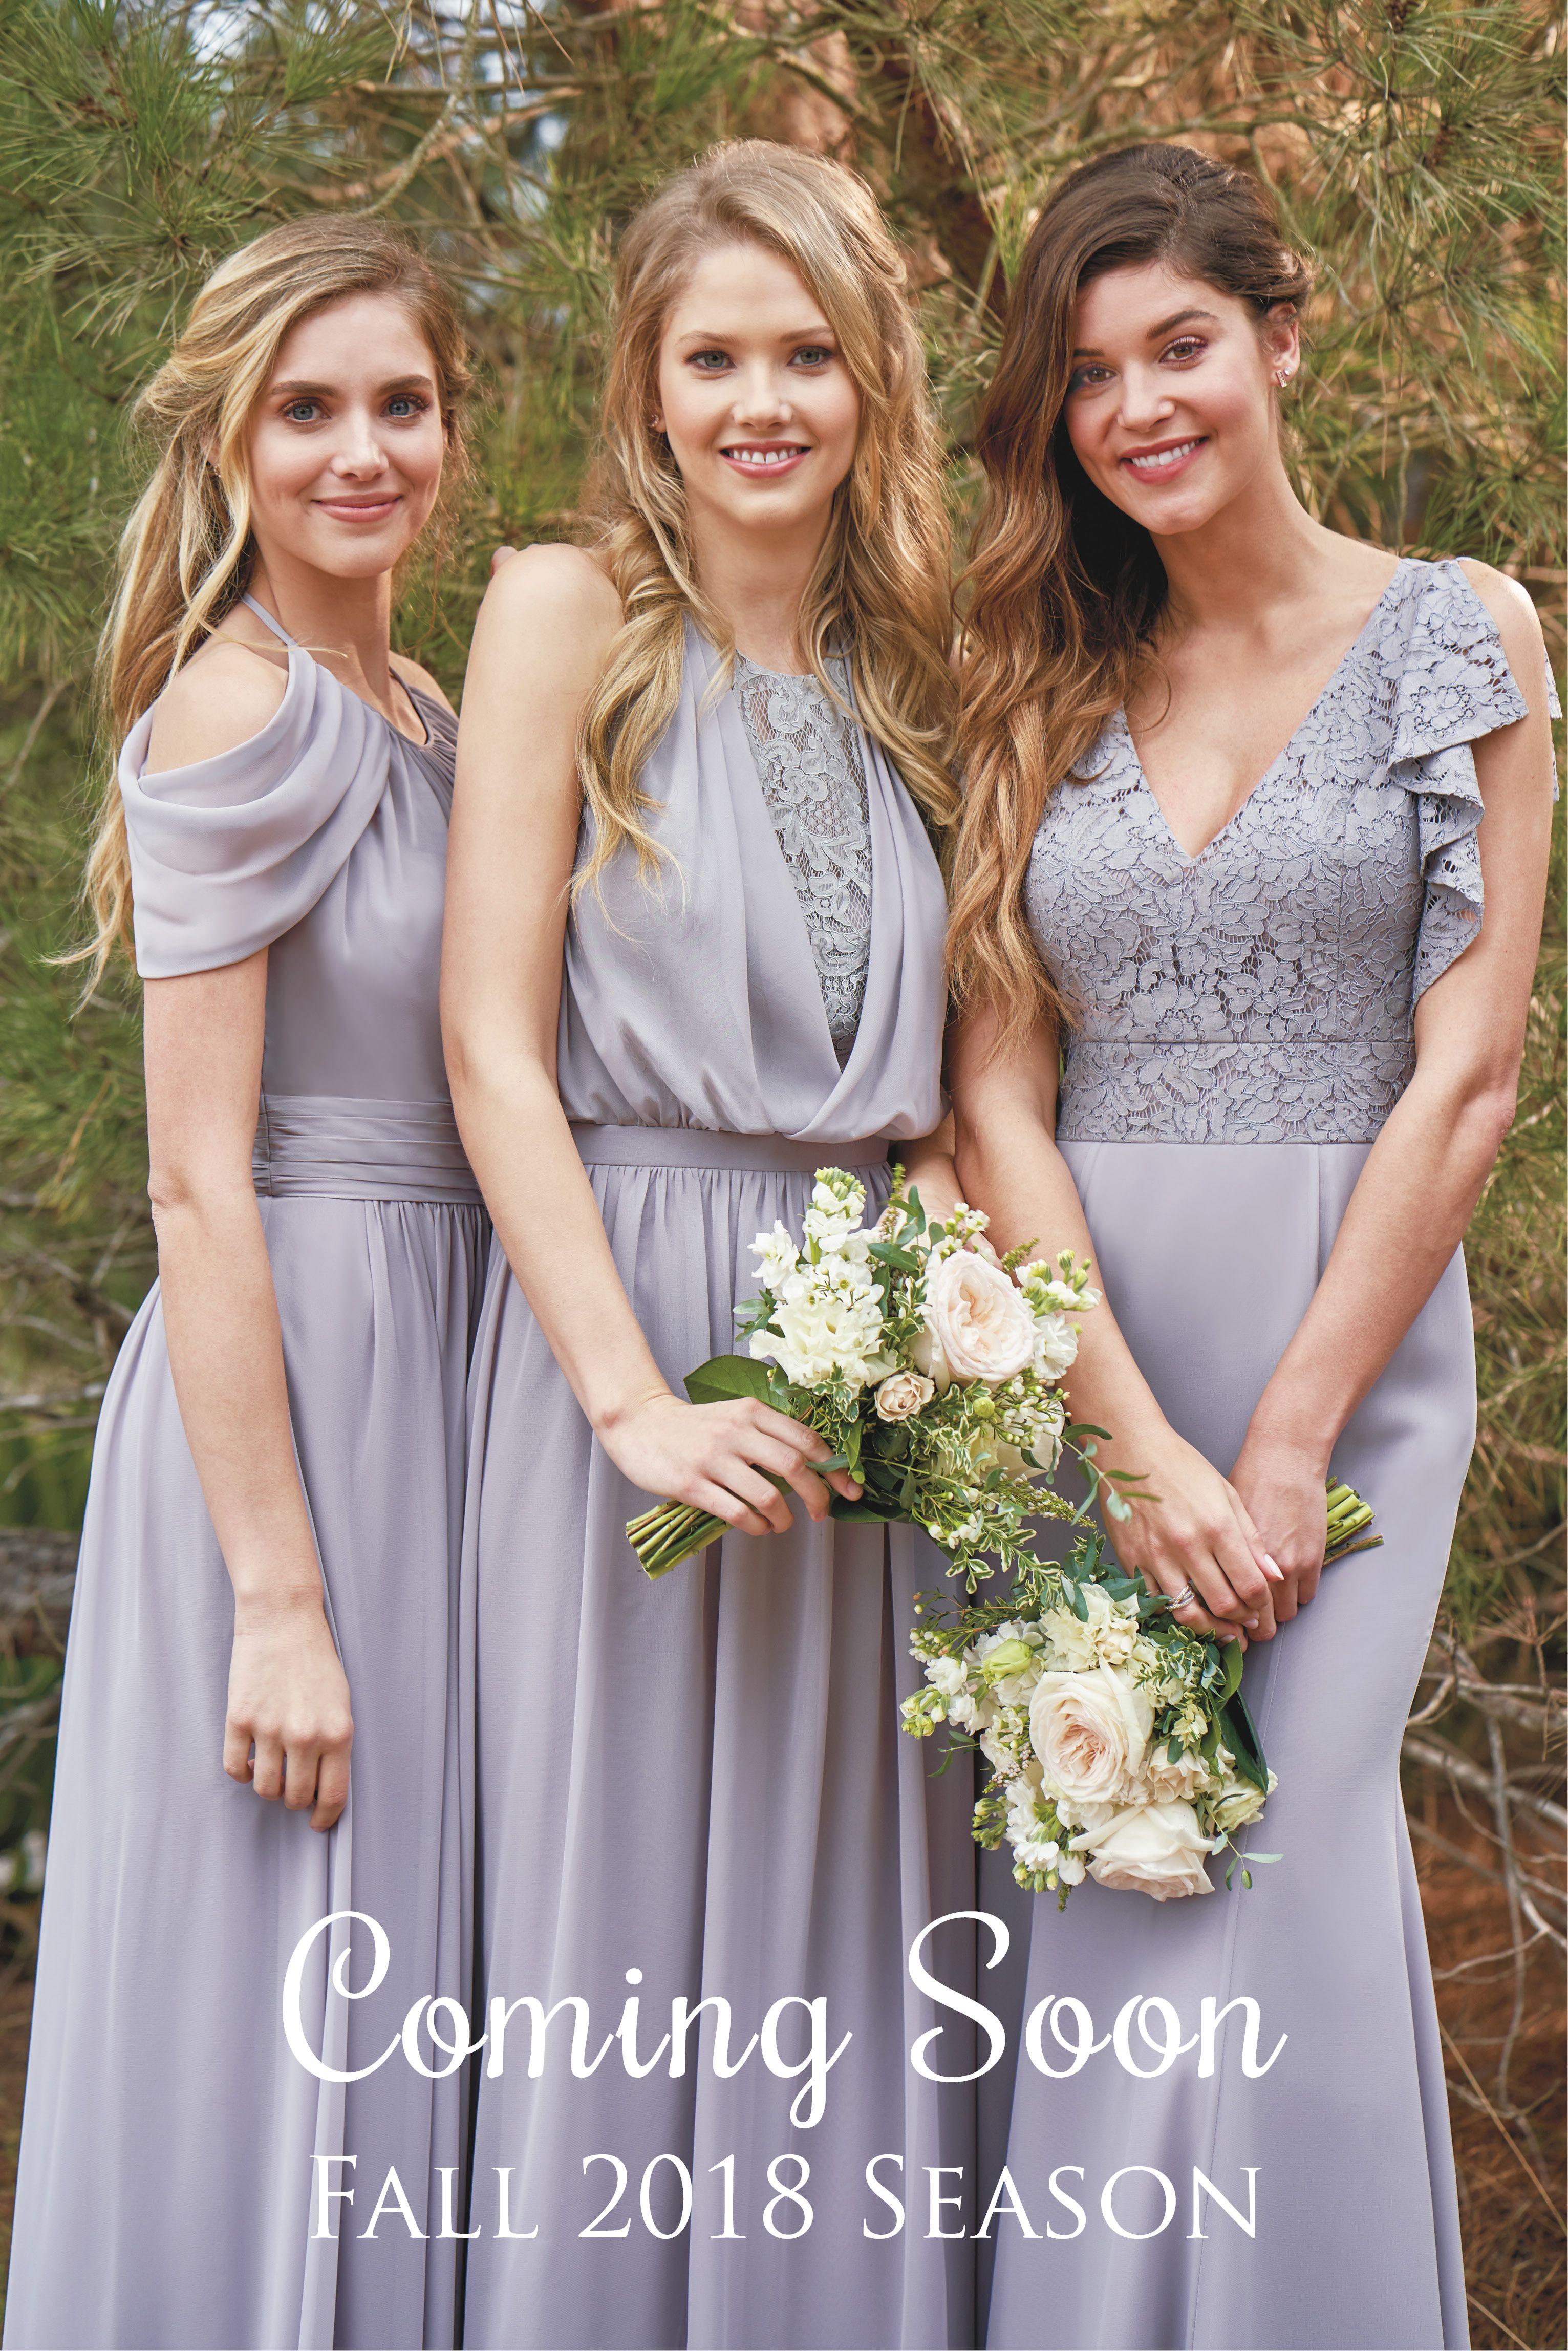 Jasmine Bridal B2 Fall 2018 Bridesmaid Line Simple Dresses Designer Mix And Match Bridesmaids Comingsoon Sneakpeak